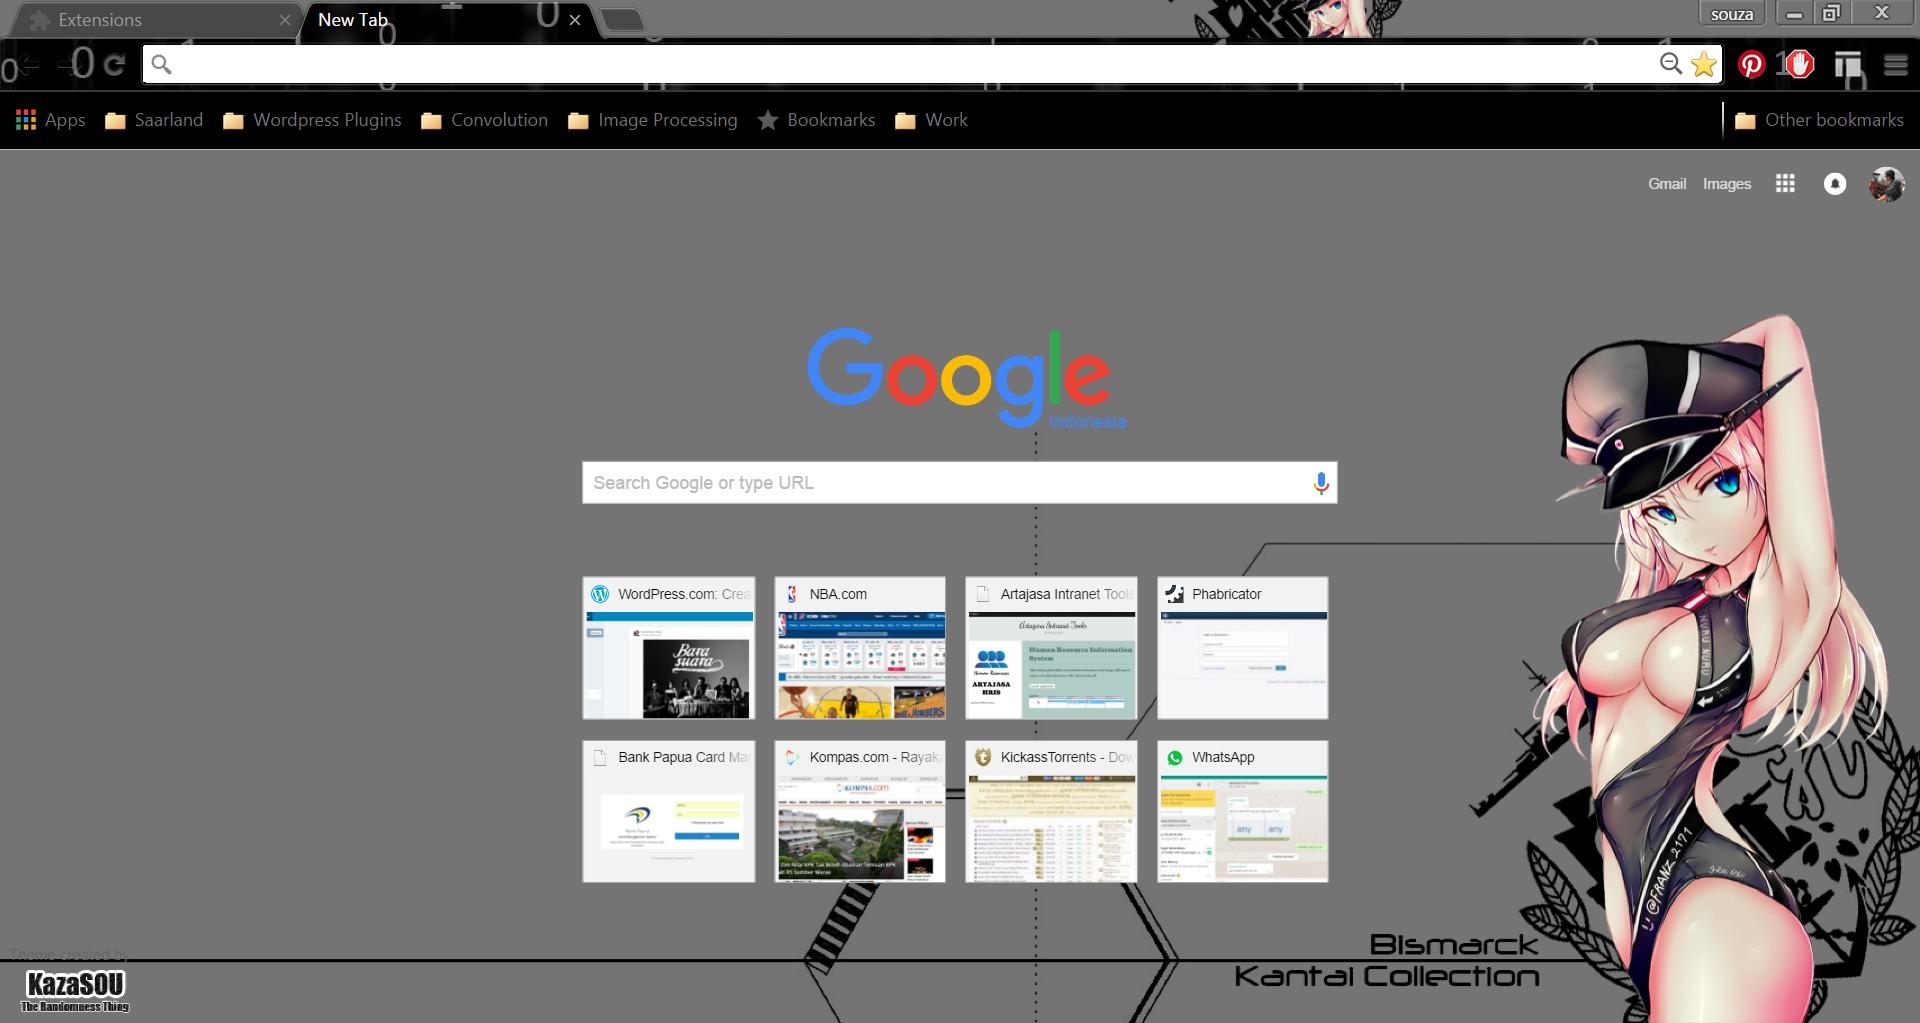 Google themes nba - Bismarck_chrome3